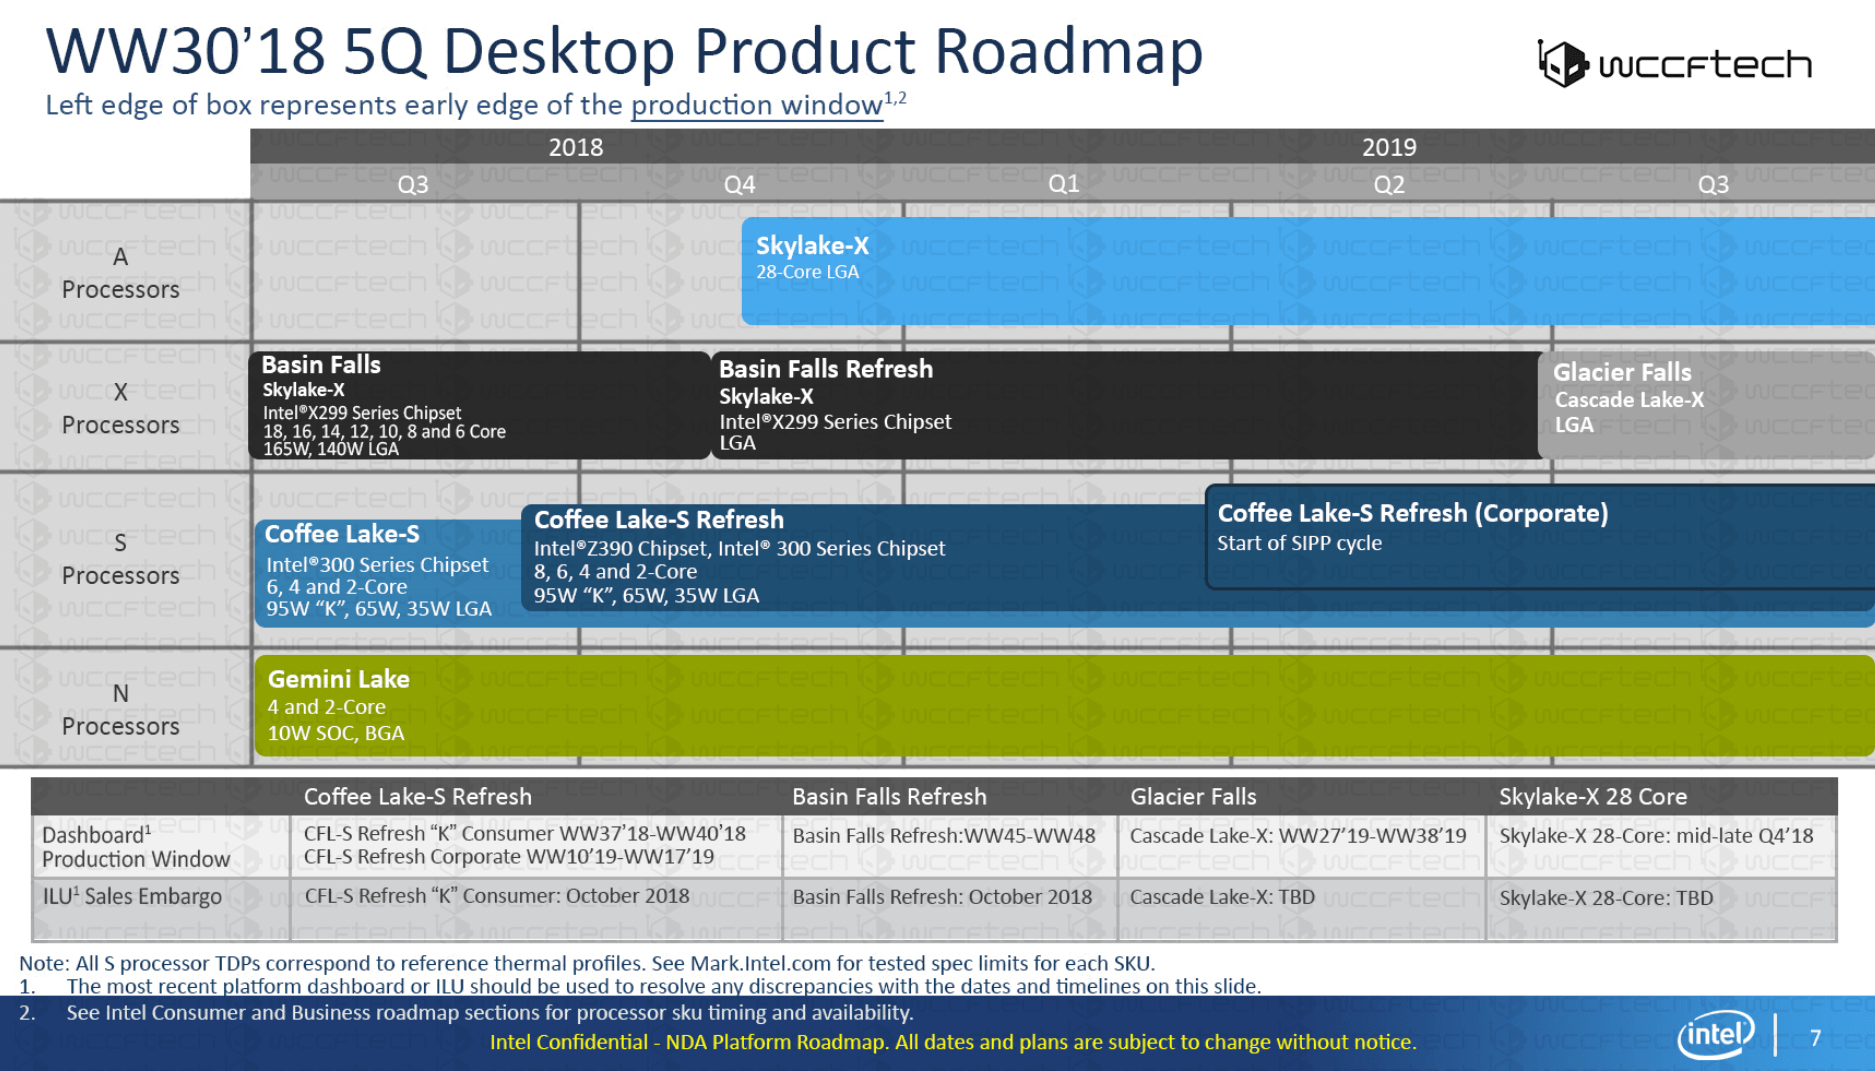 Intel Consumer Roadmap 2018/2019